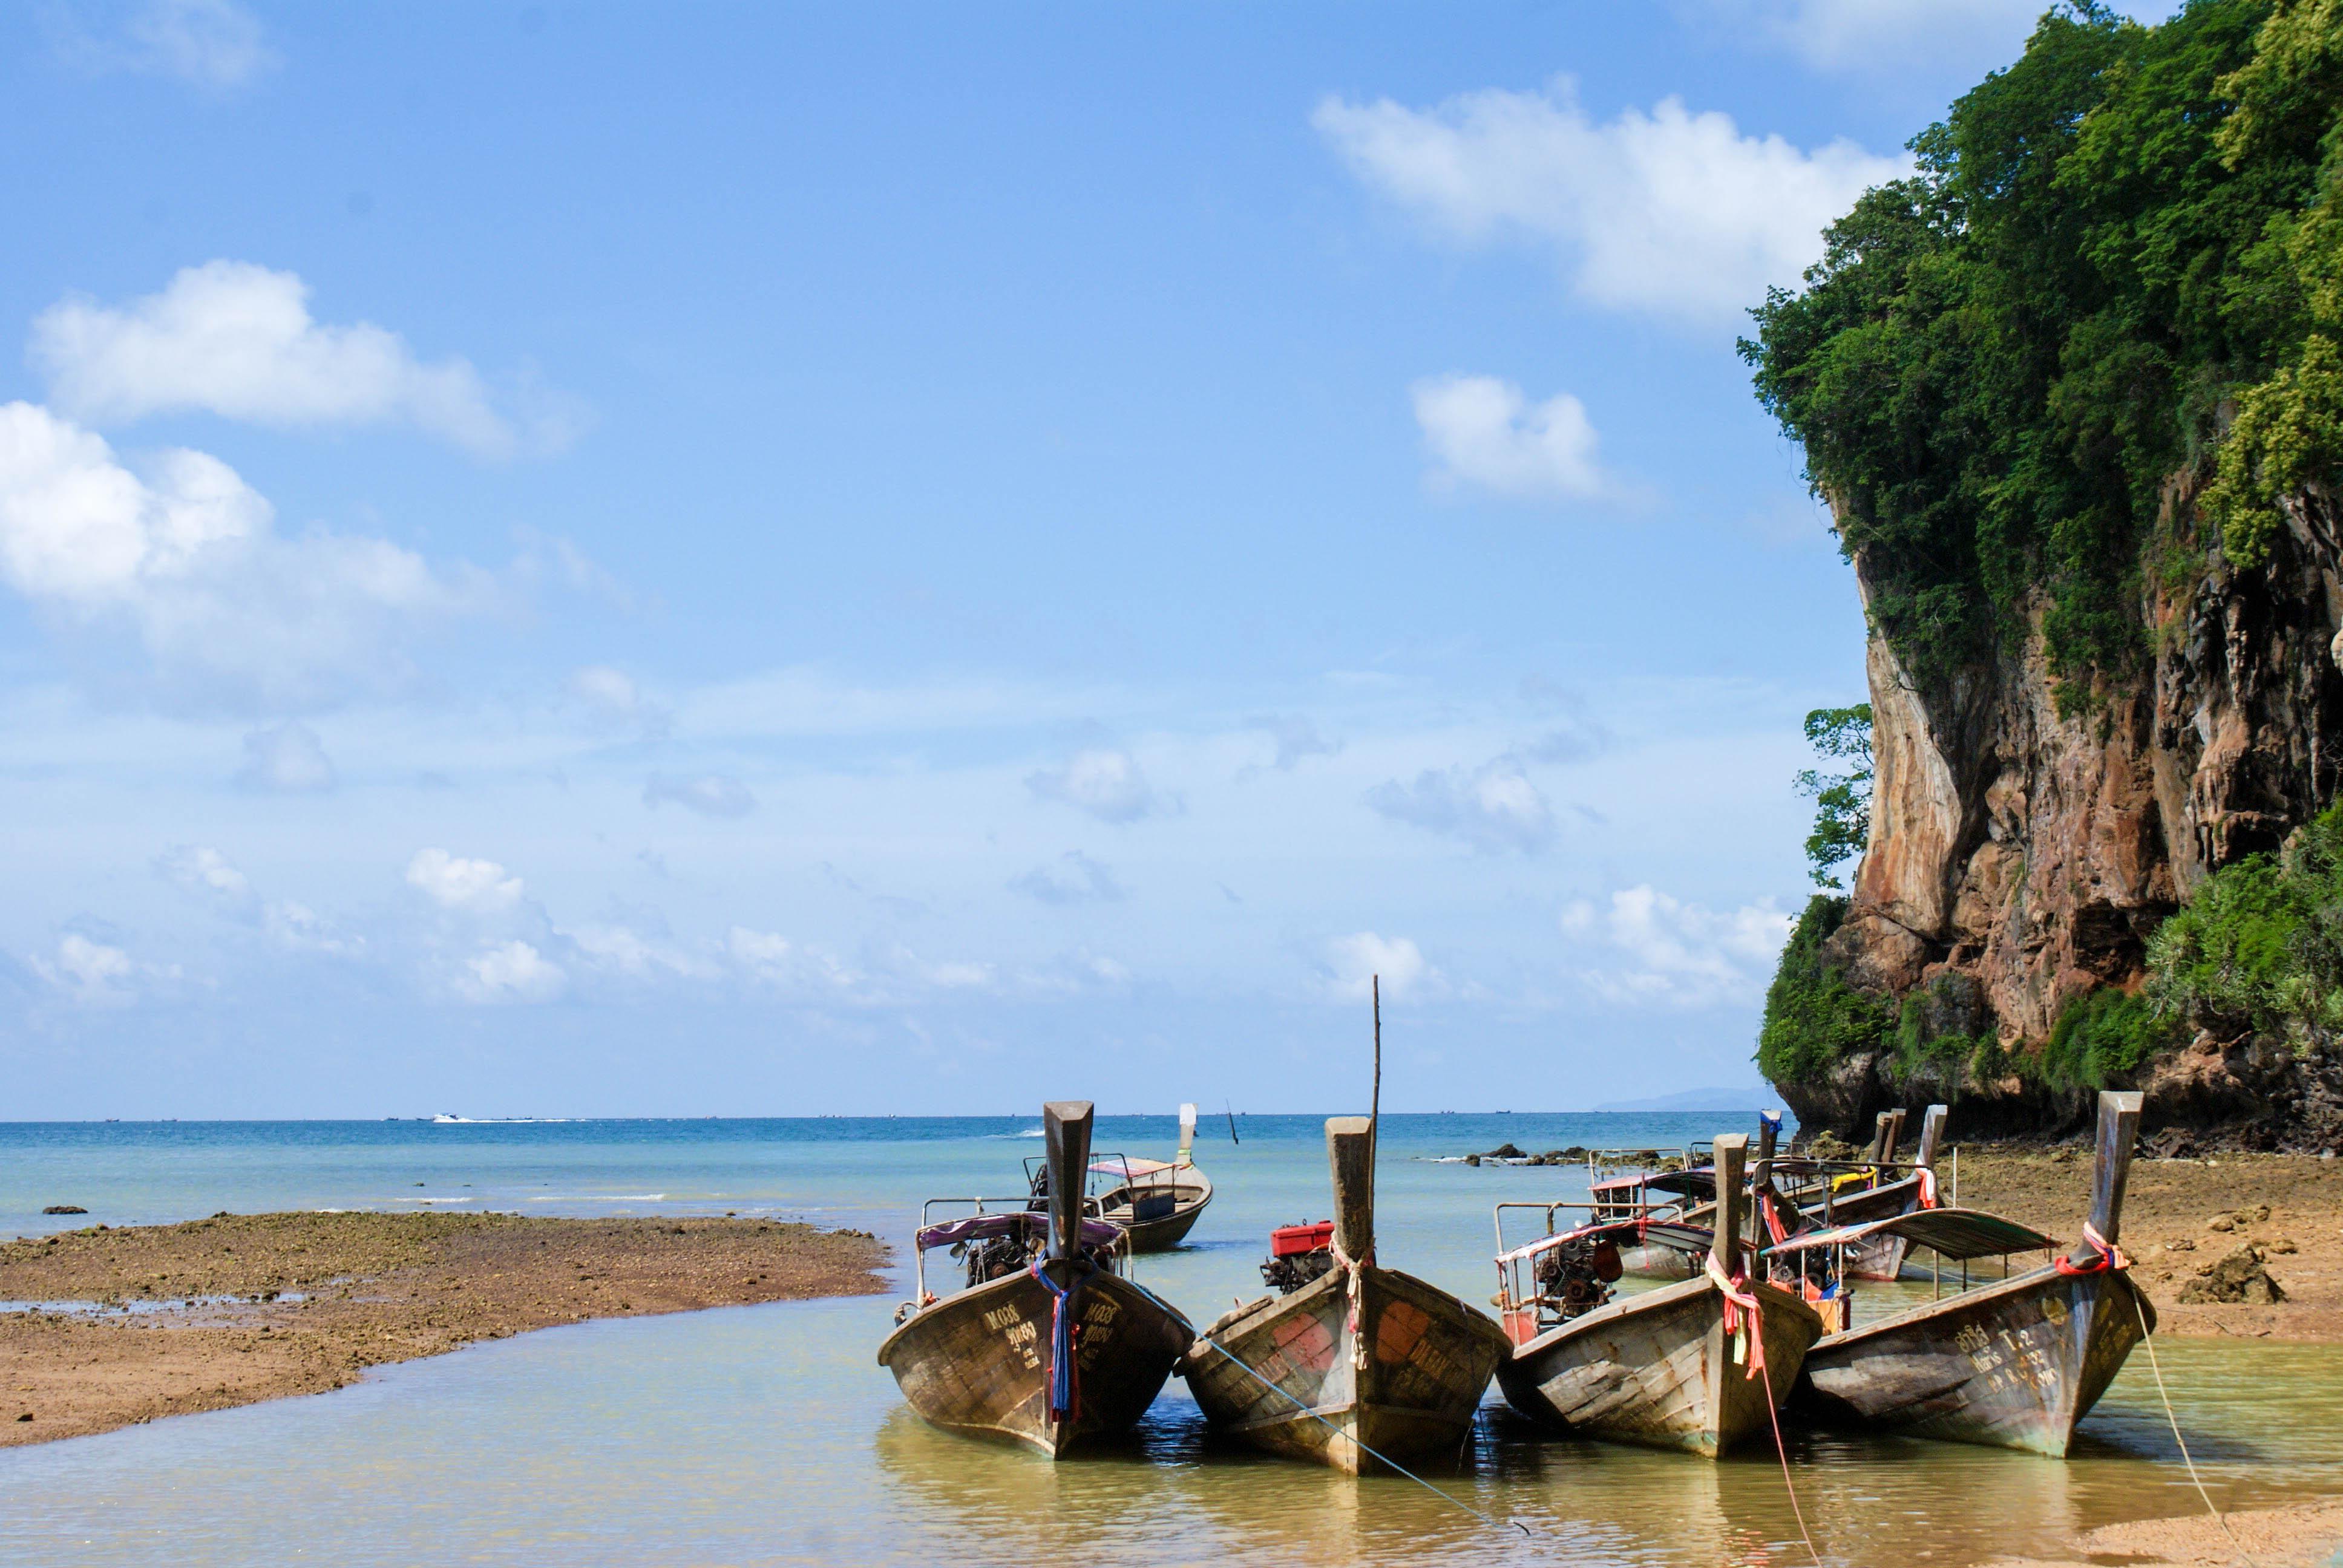 Postcards from Thailand: Railay, Krabi Photo Journal - Hat Ton Sai Beach